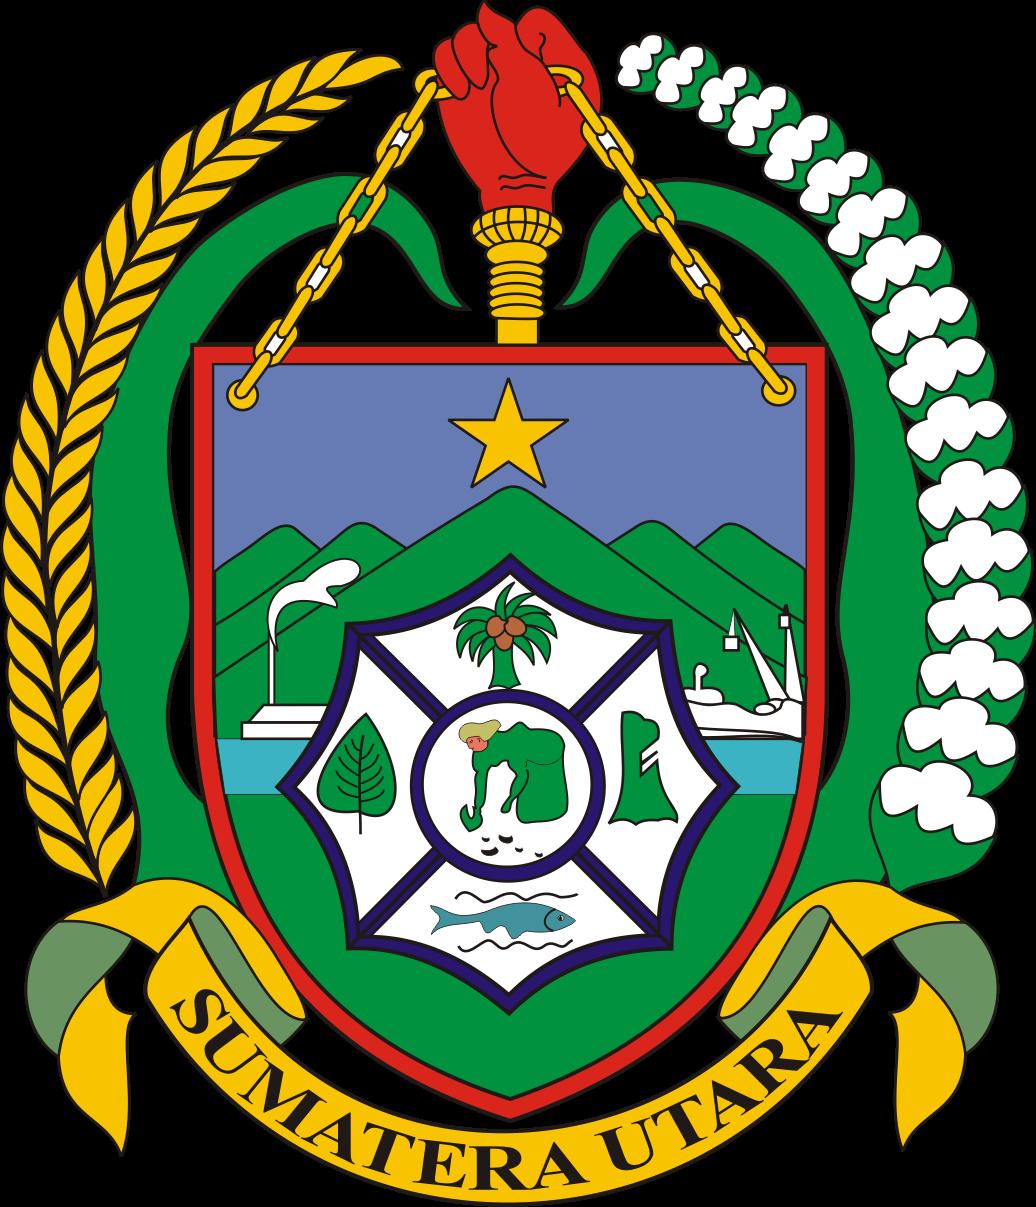 Informasi Penerimaan Cpns 2013 Di Sumatera Utara Lowongan Kerja Agustus 2016 Terbaru Info Cpns 2016 Von Pendaftaran Cpns Sumatera Utara 2014 May 2016 B252;cher Verkaufen